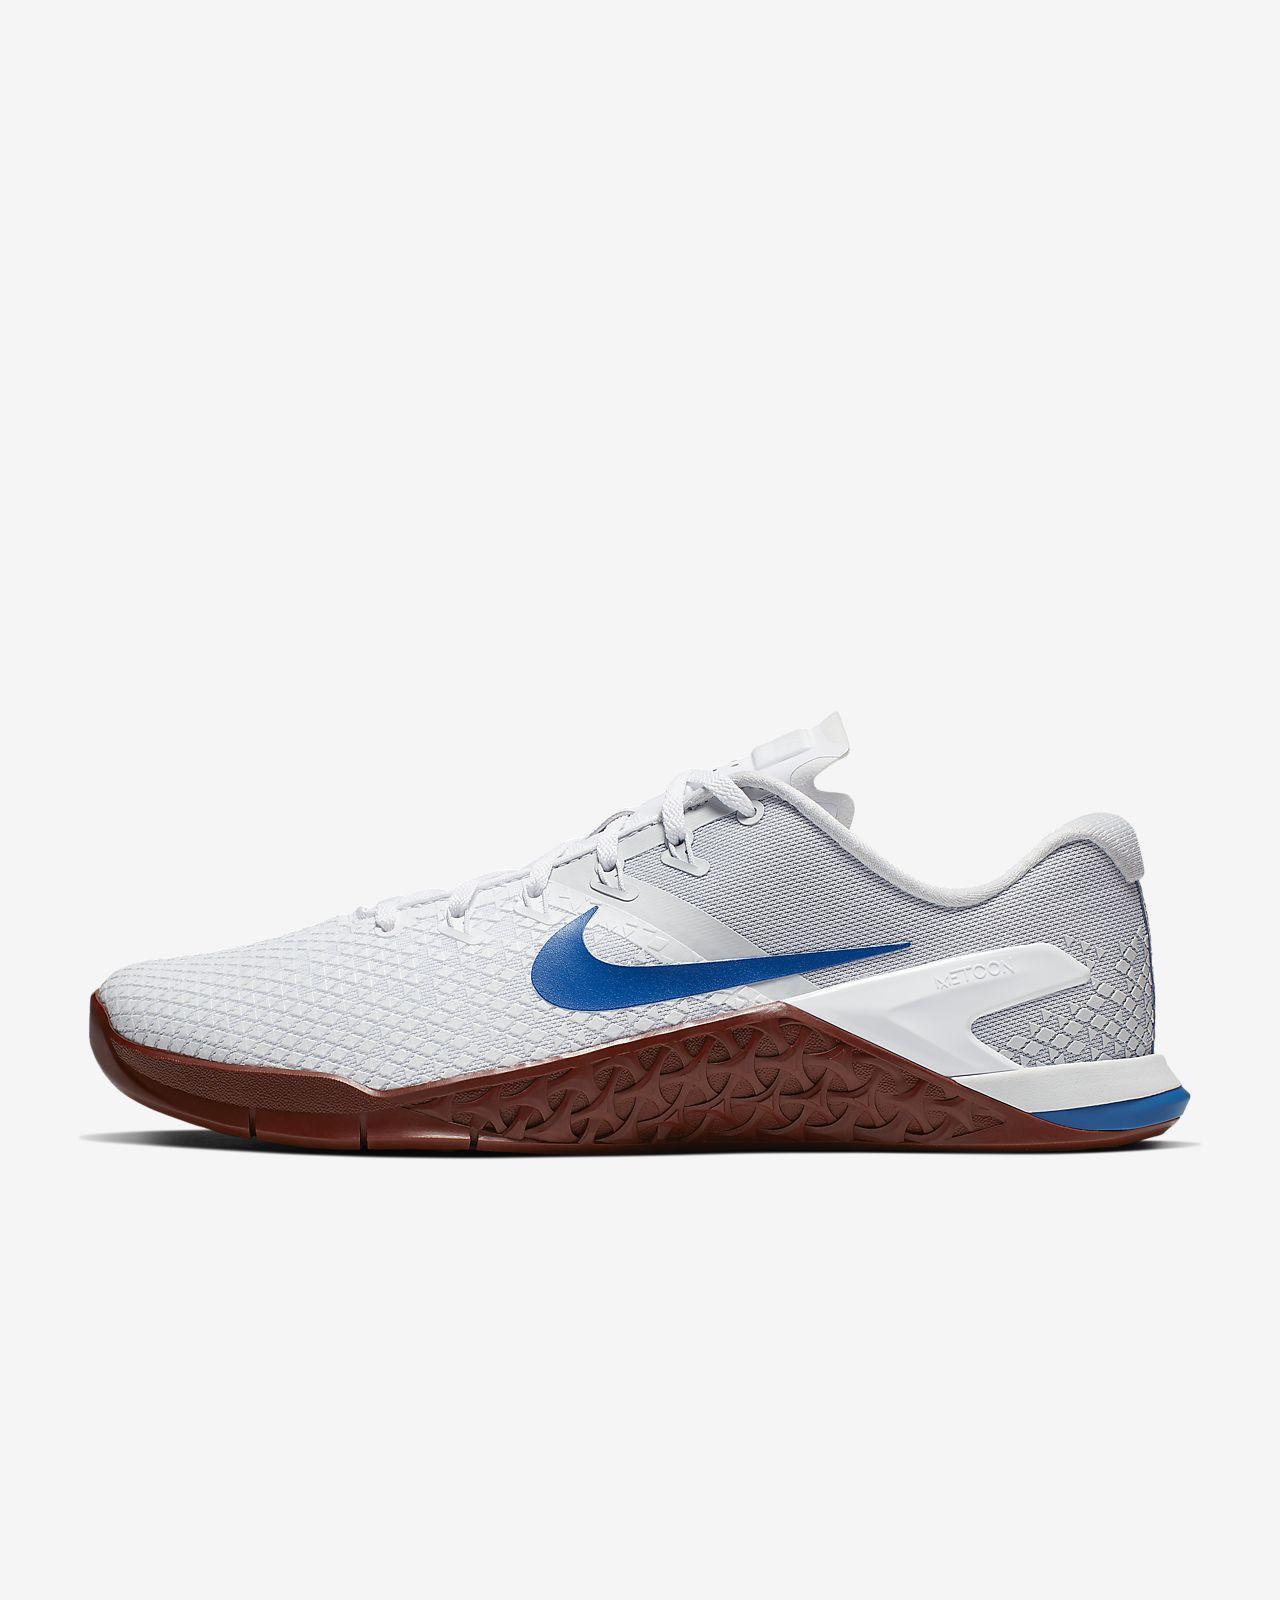 6ca6740eba6498 Nike Metcon 4 XD Men s Training Shoe. Nike.com LU